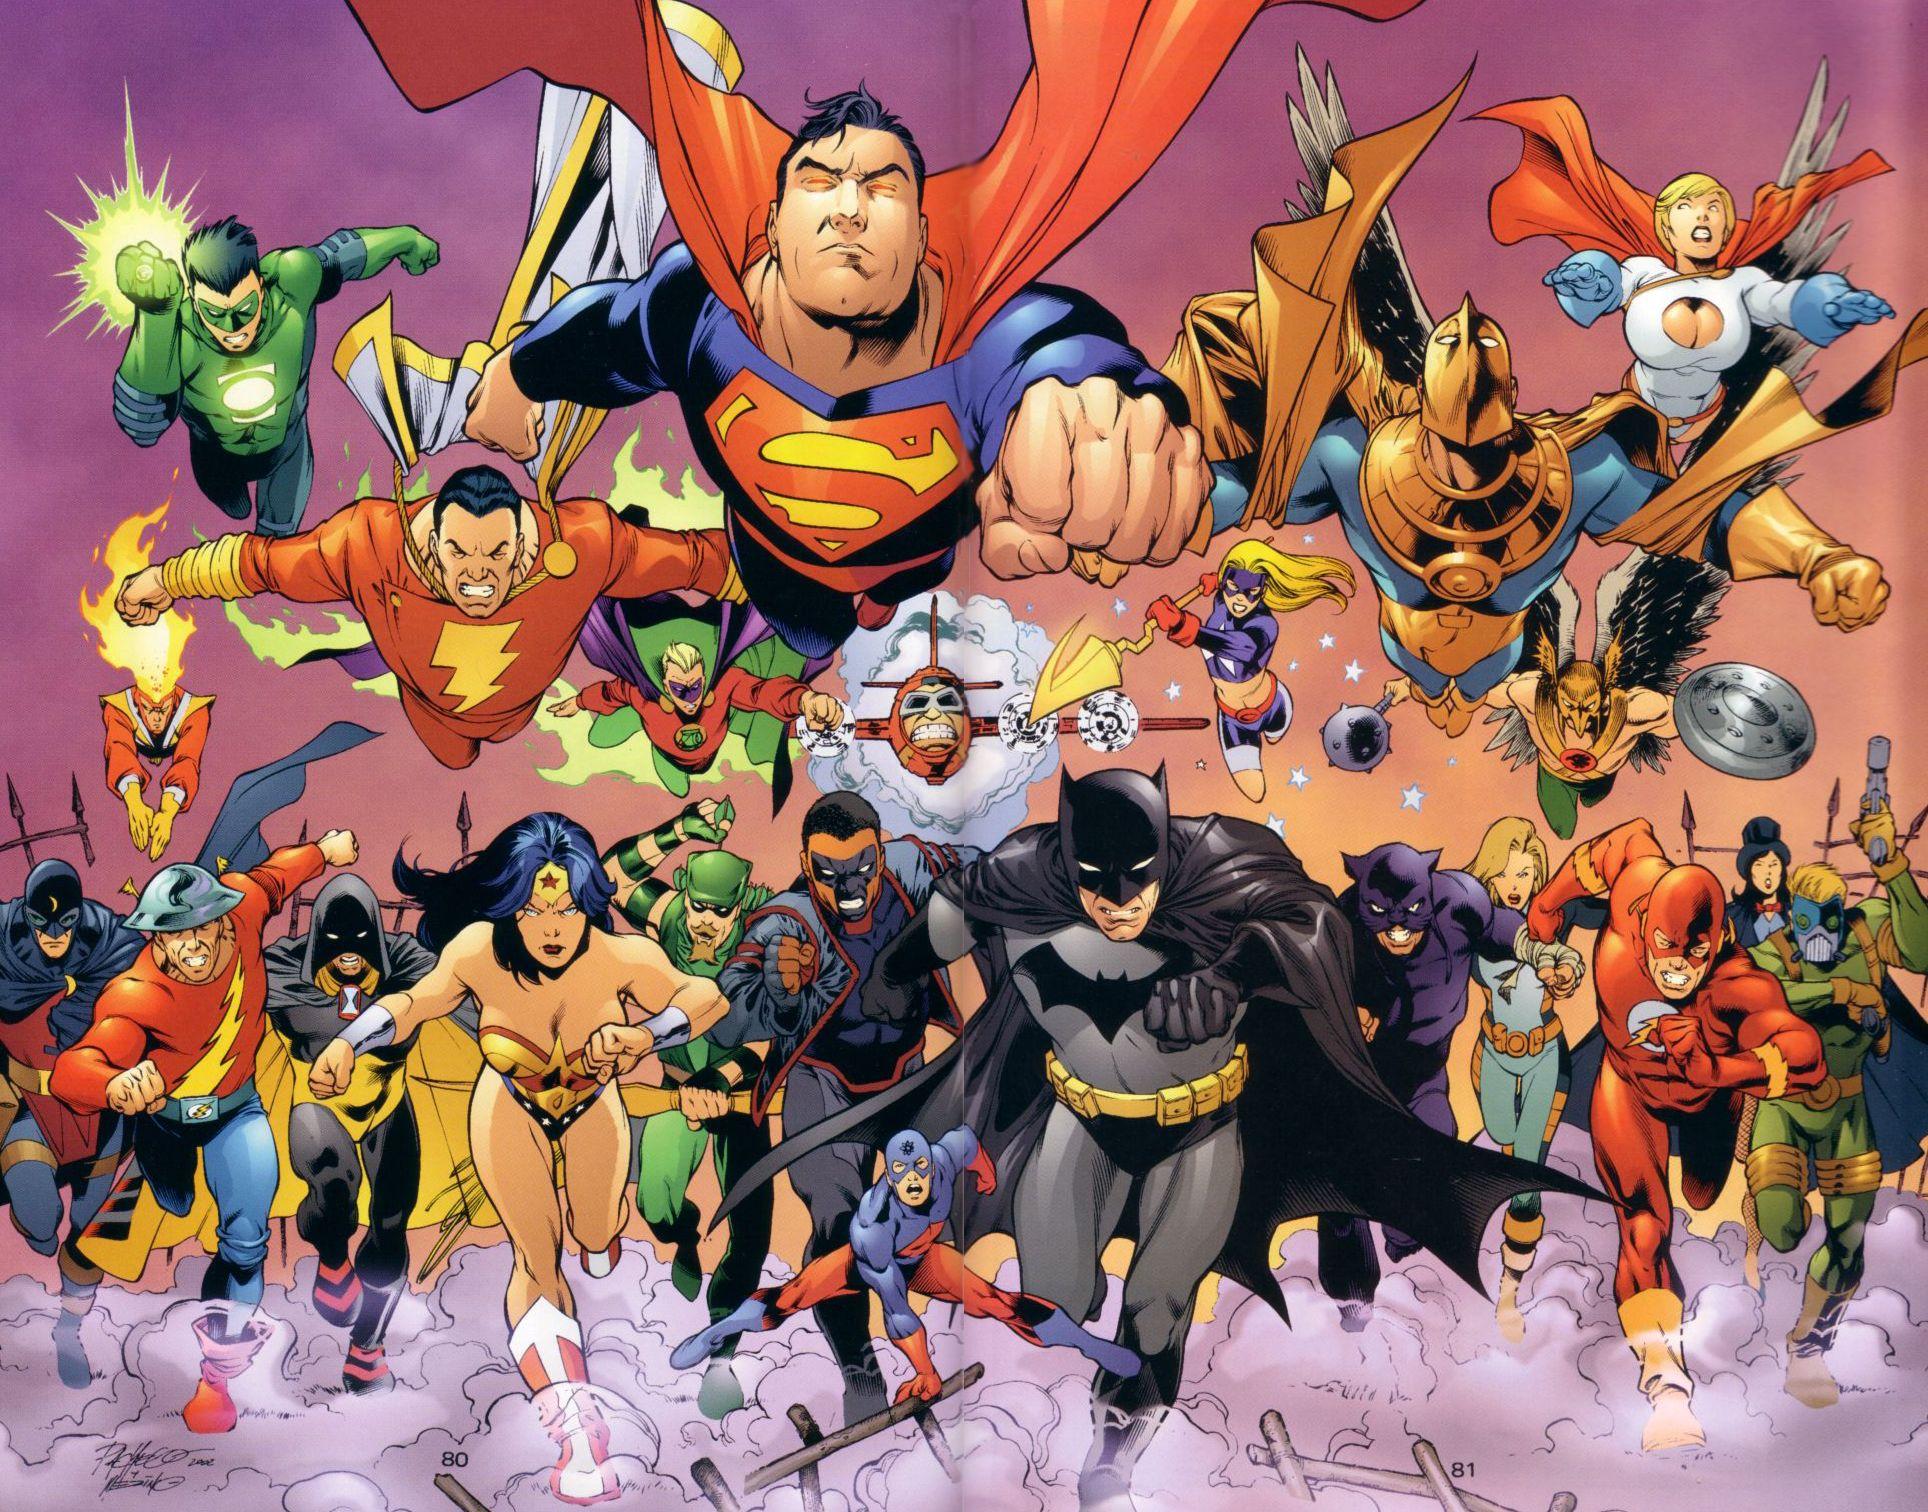 супергероев все картинки последний раз, словам